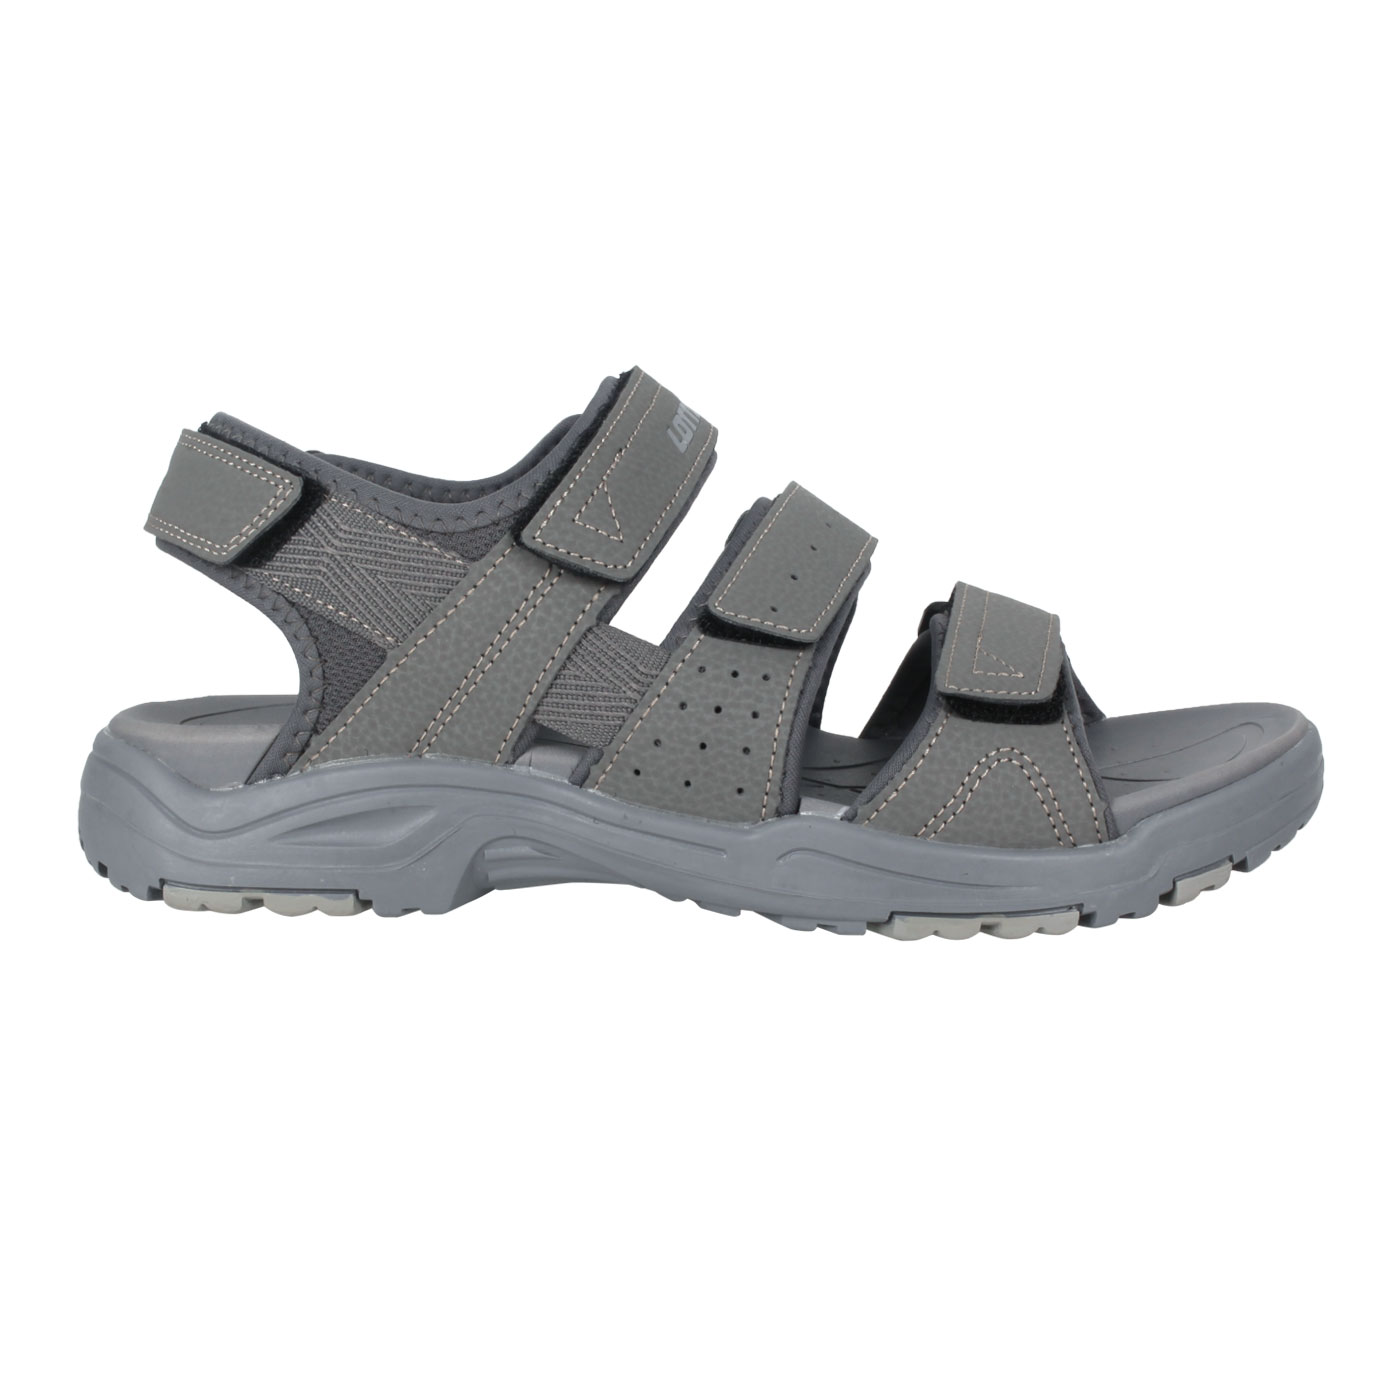 LOTTO 男款運動涼鞋 LT1AMS3358 - 灰